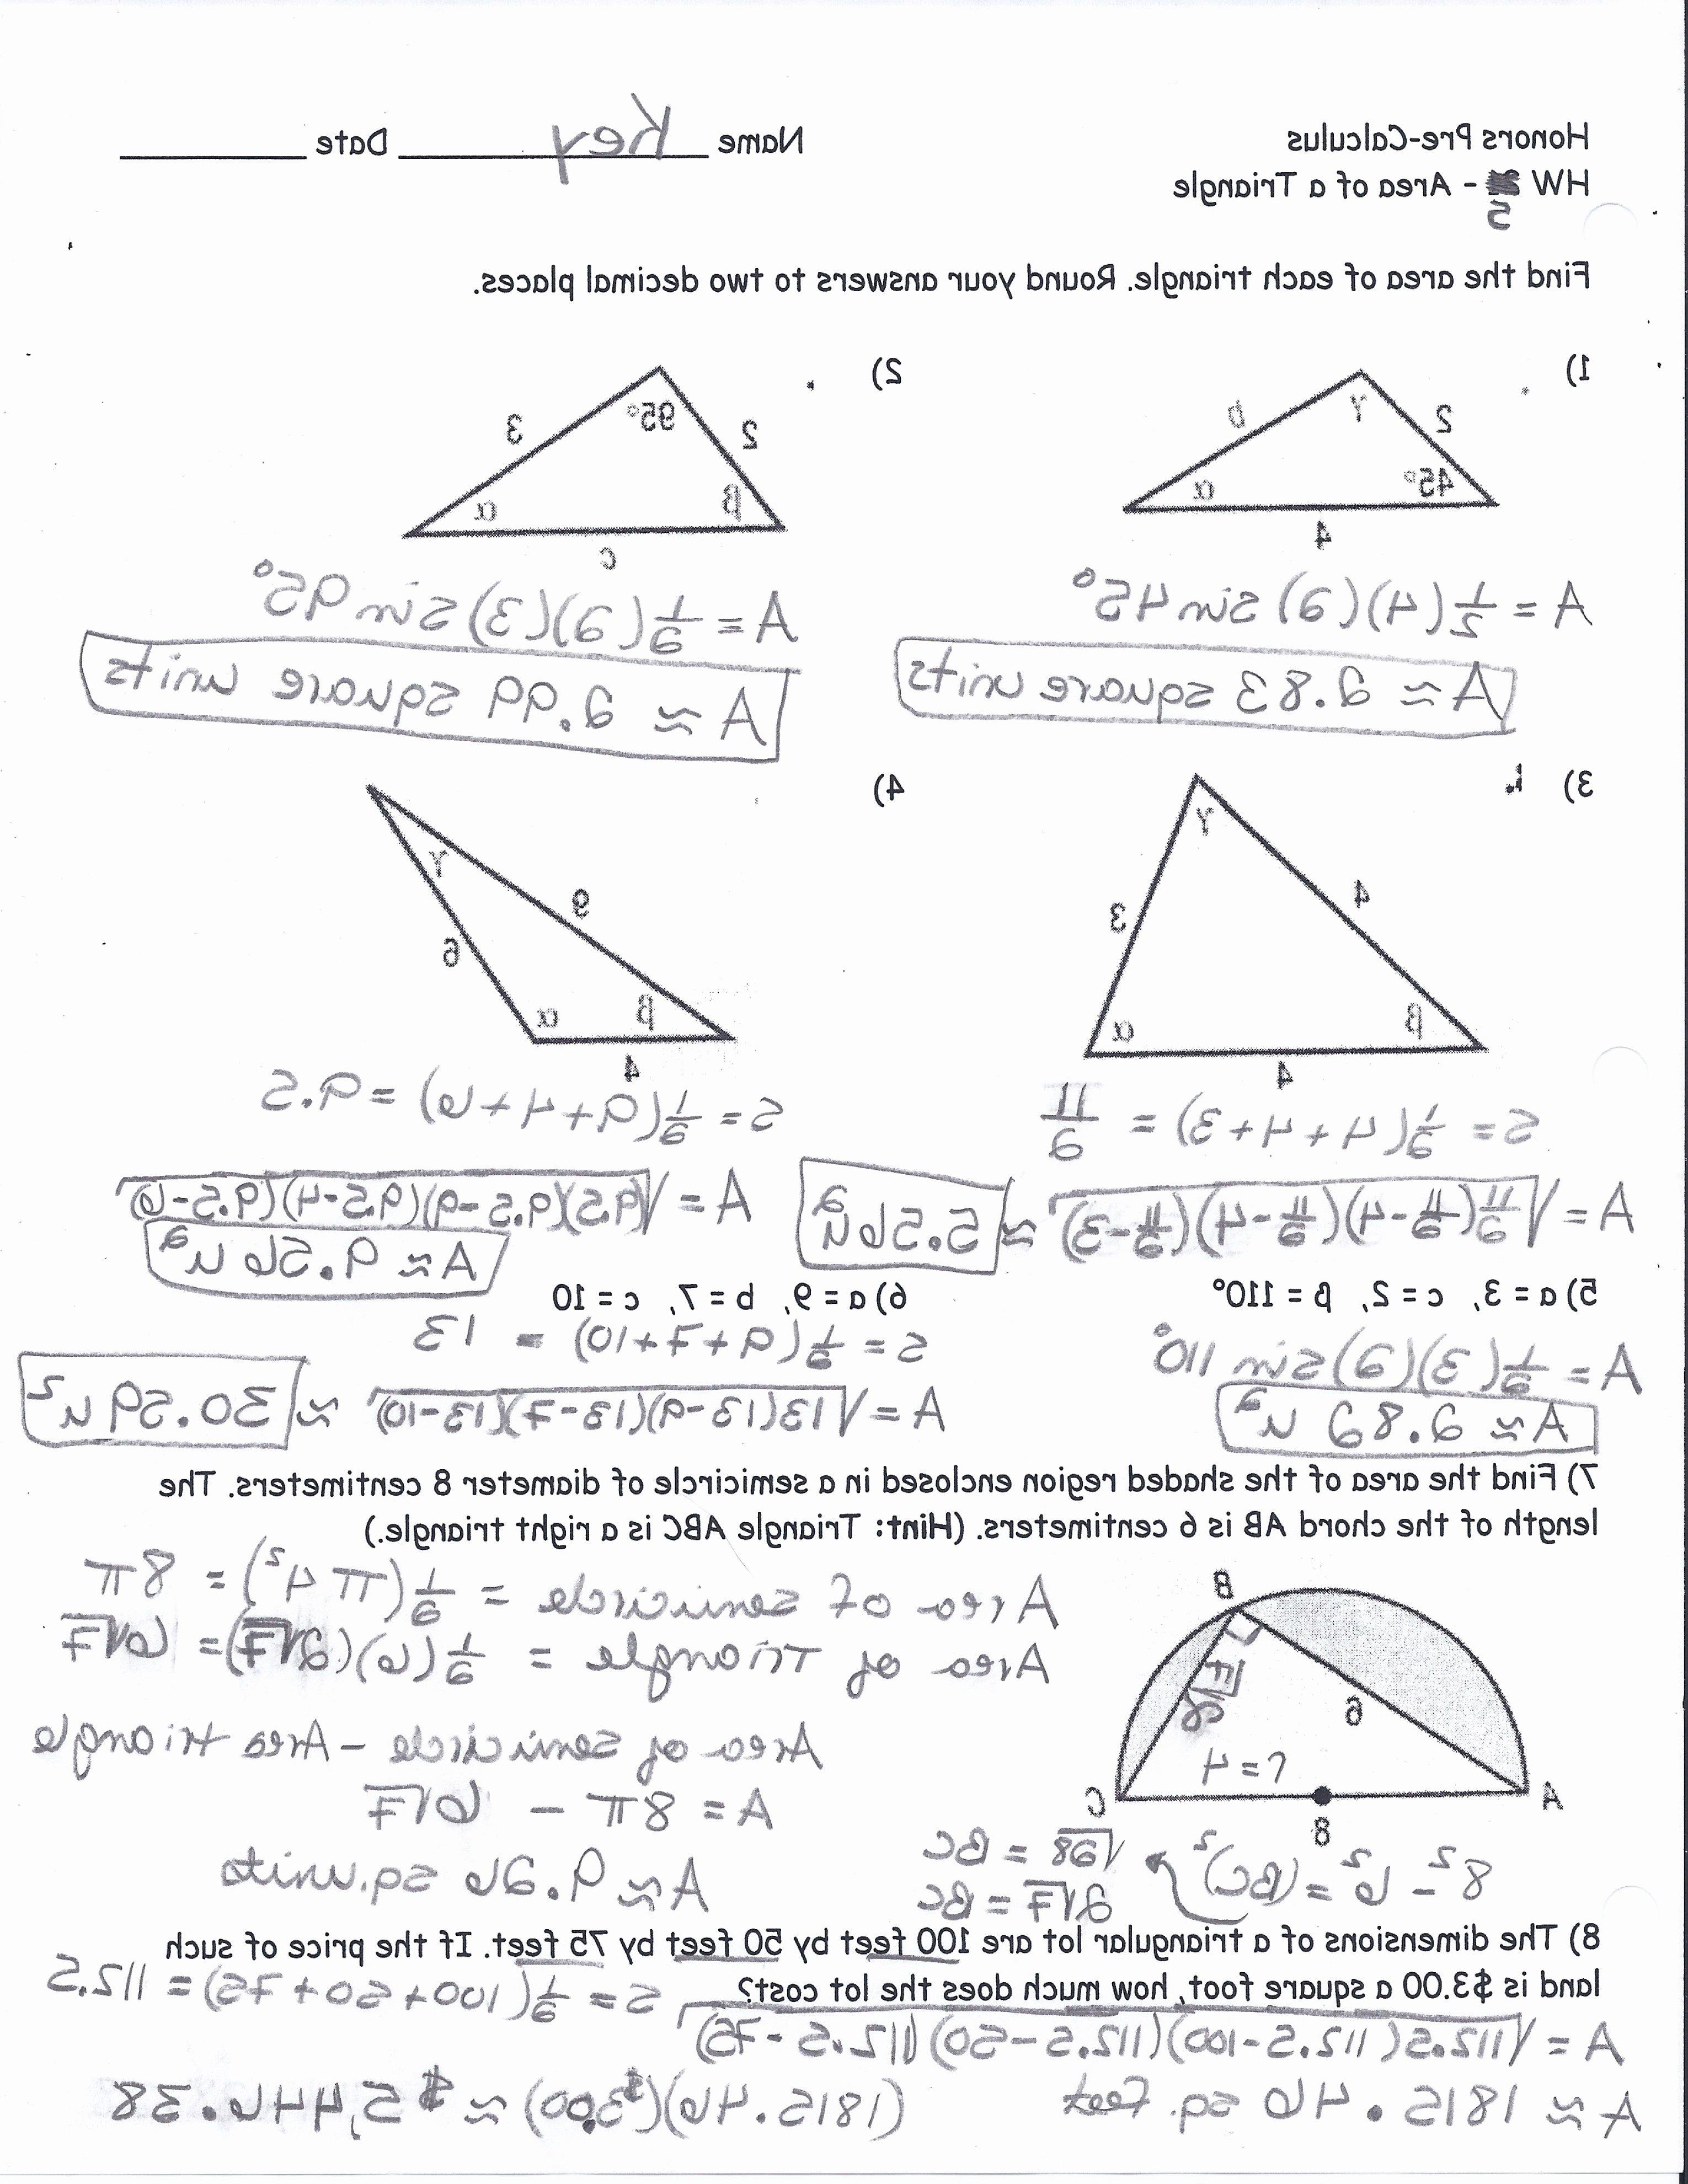 Right Triangle Trigonometry Worksheet Elegant Right Triangle Trigonometry Worksheet with Answers